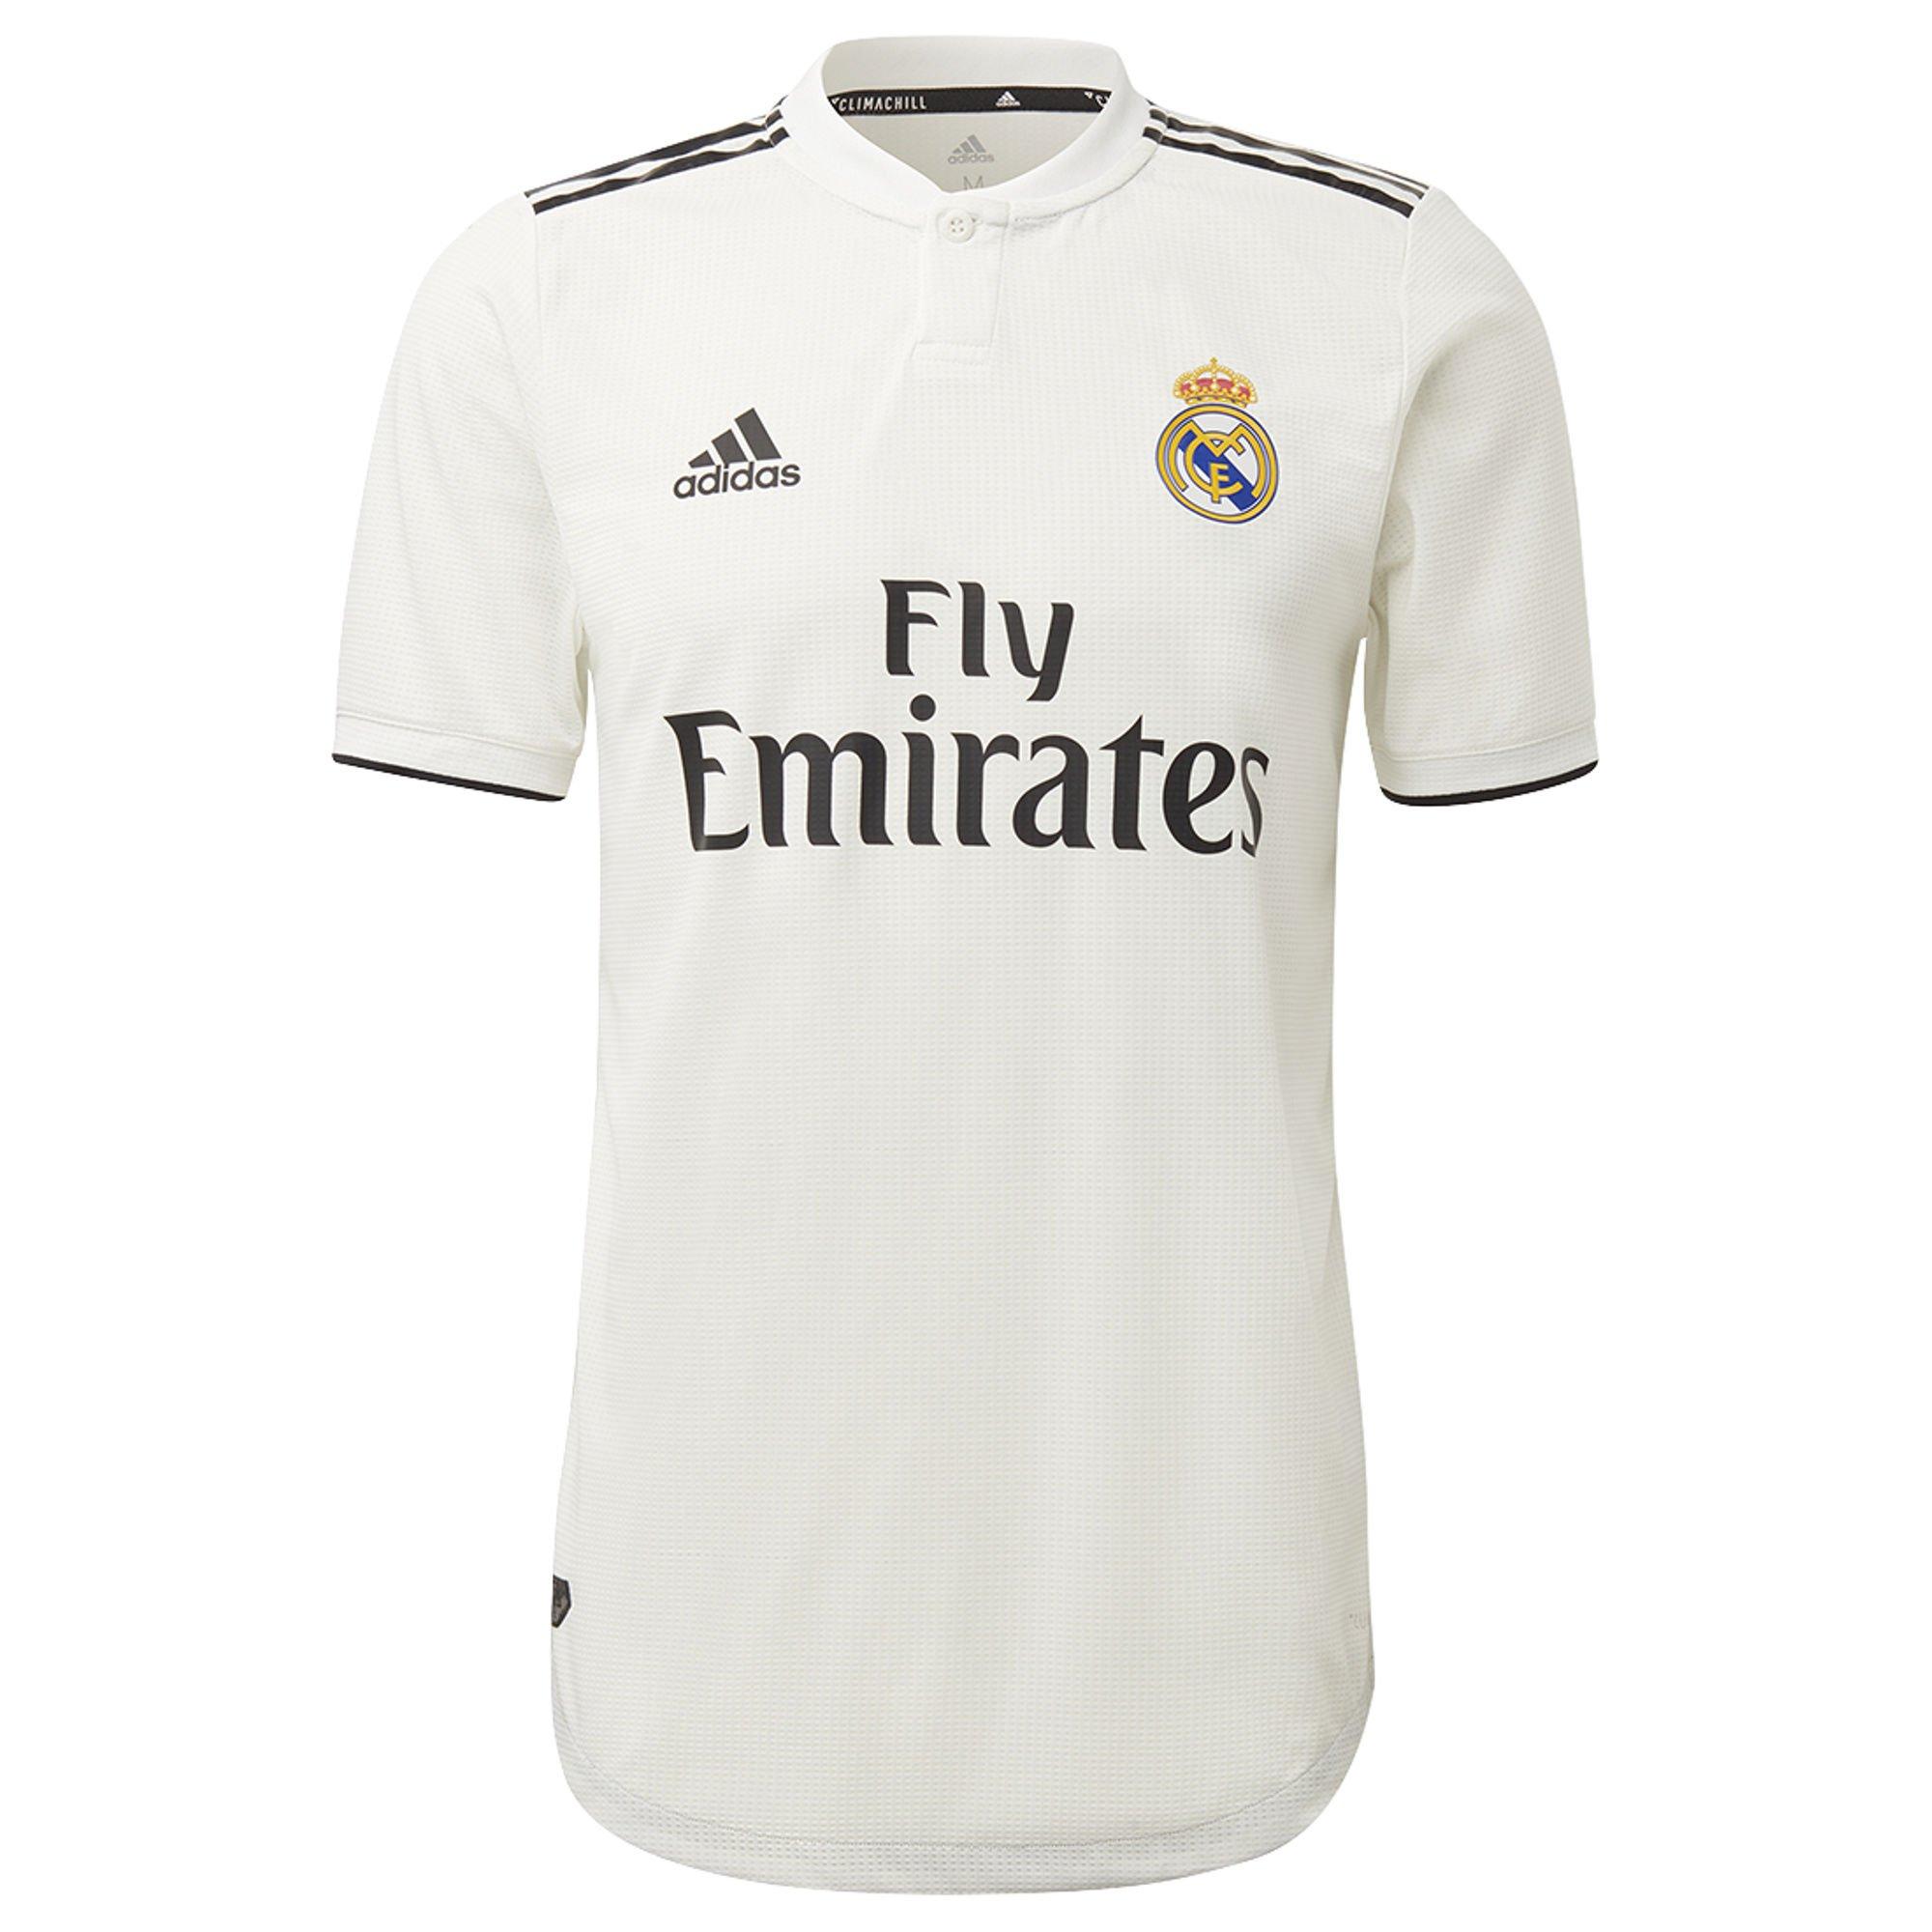 adidas Real Madrid adizero Thuisshirt 2018-2019